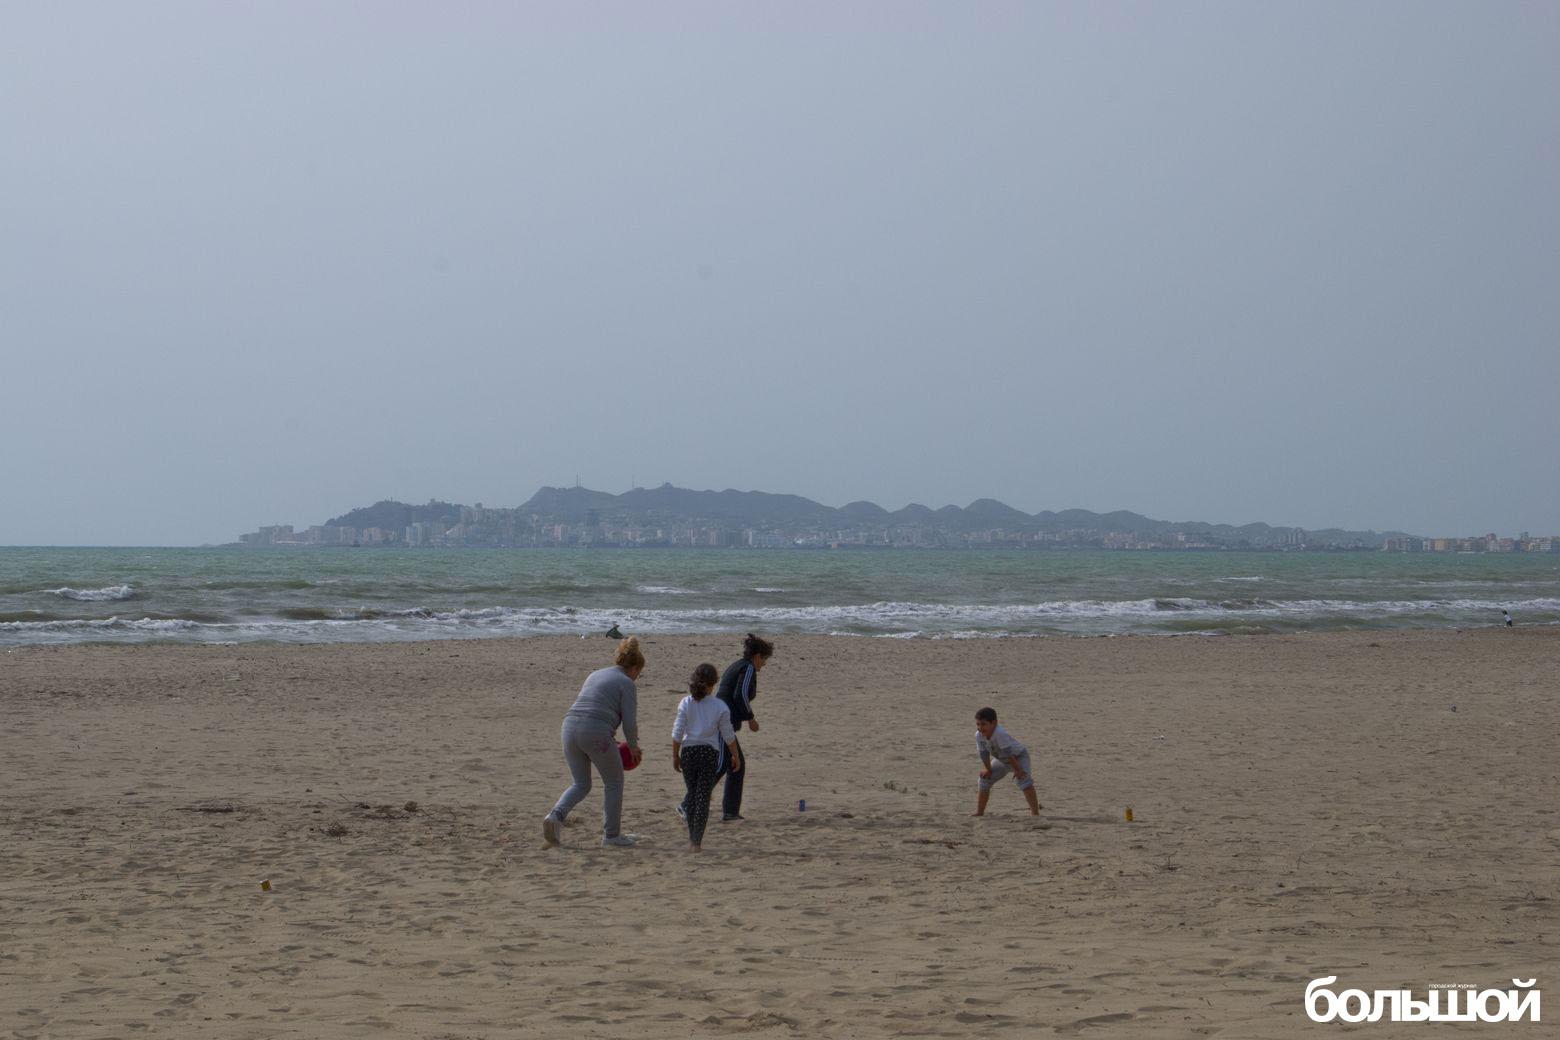 Люди играют в футбол на пляже